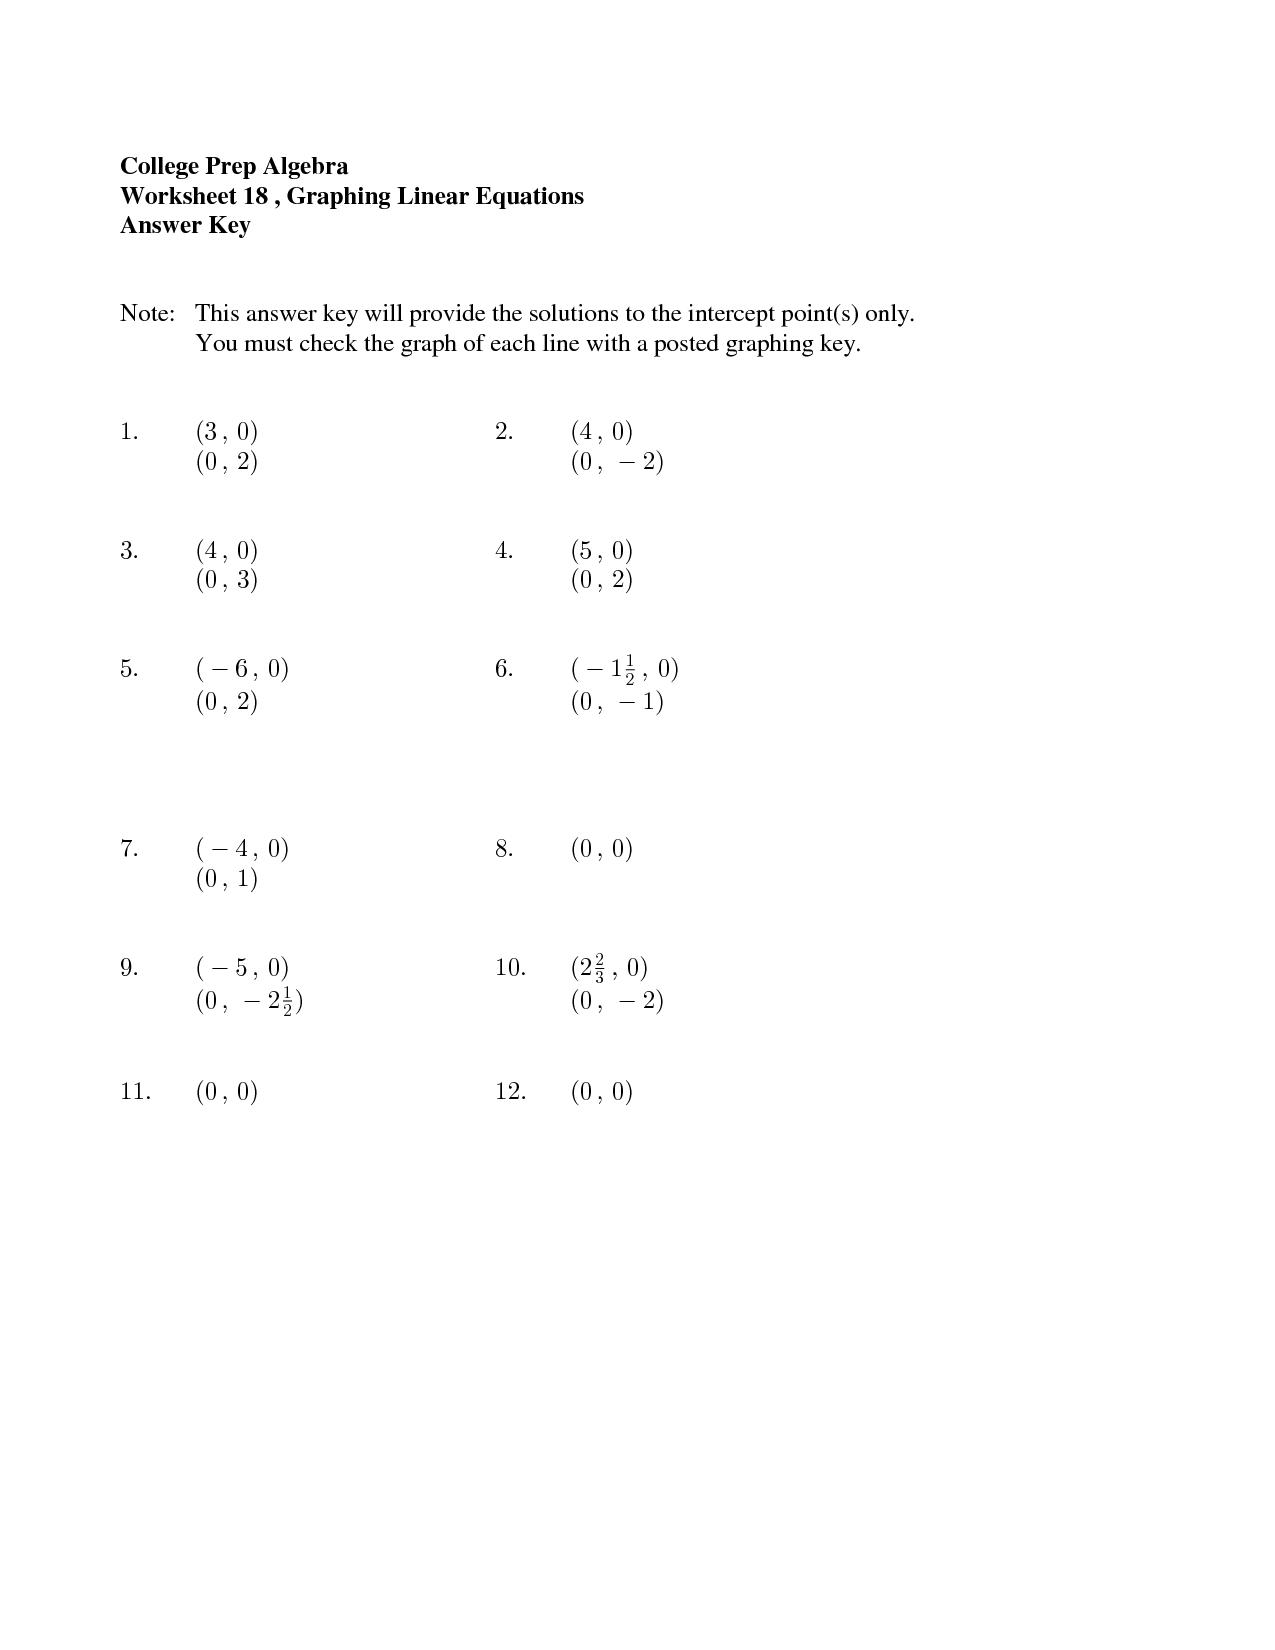 16 Best Images of College Math Worksheets  College Algebra Worksheets Printable, College